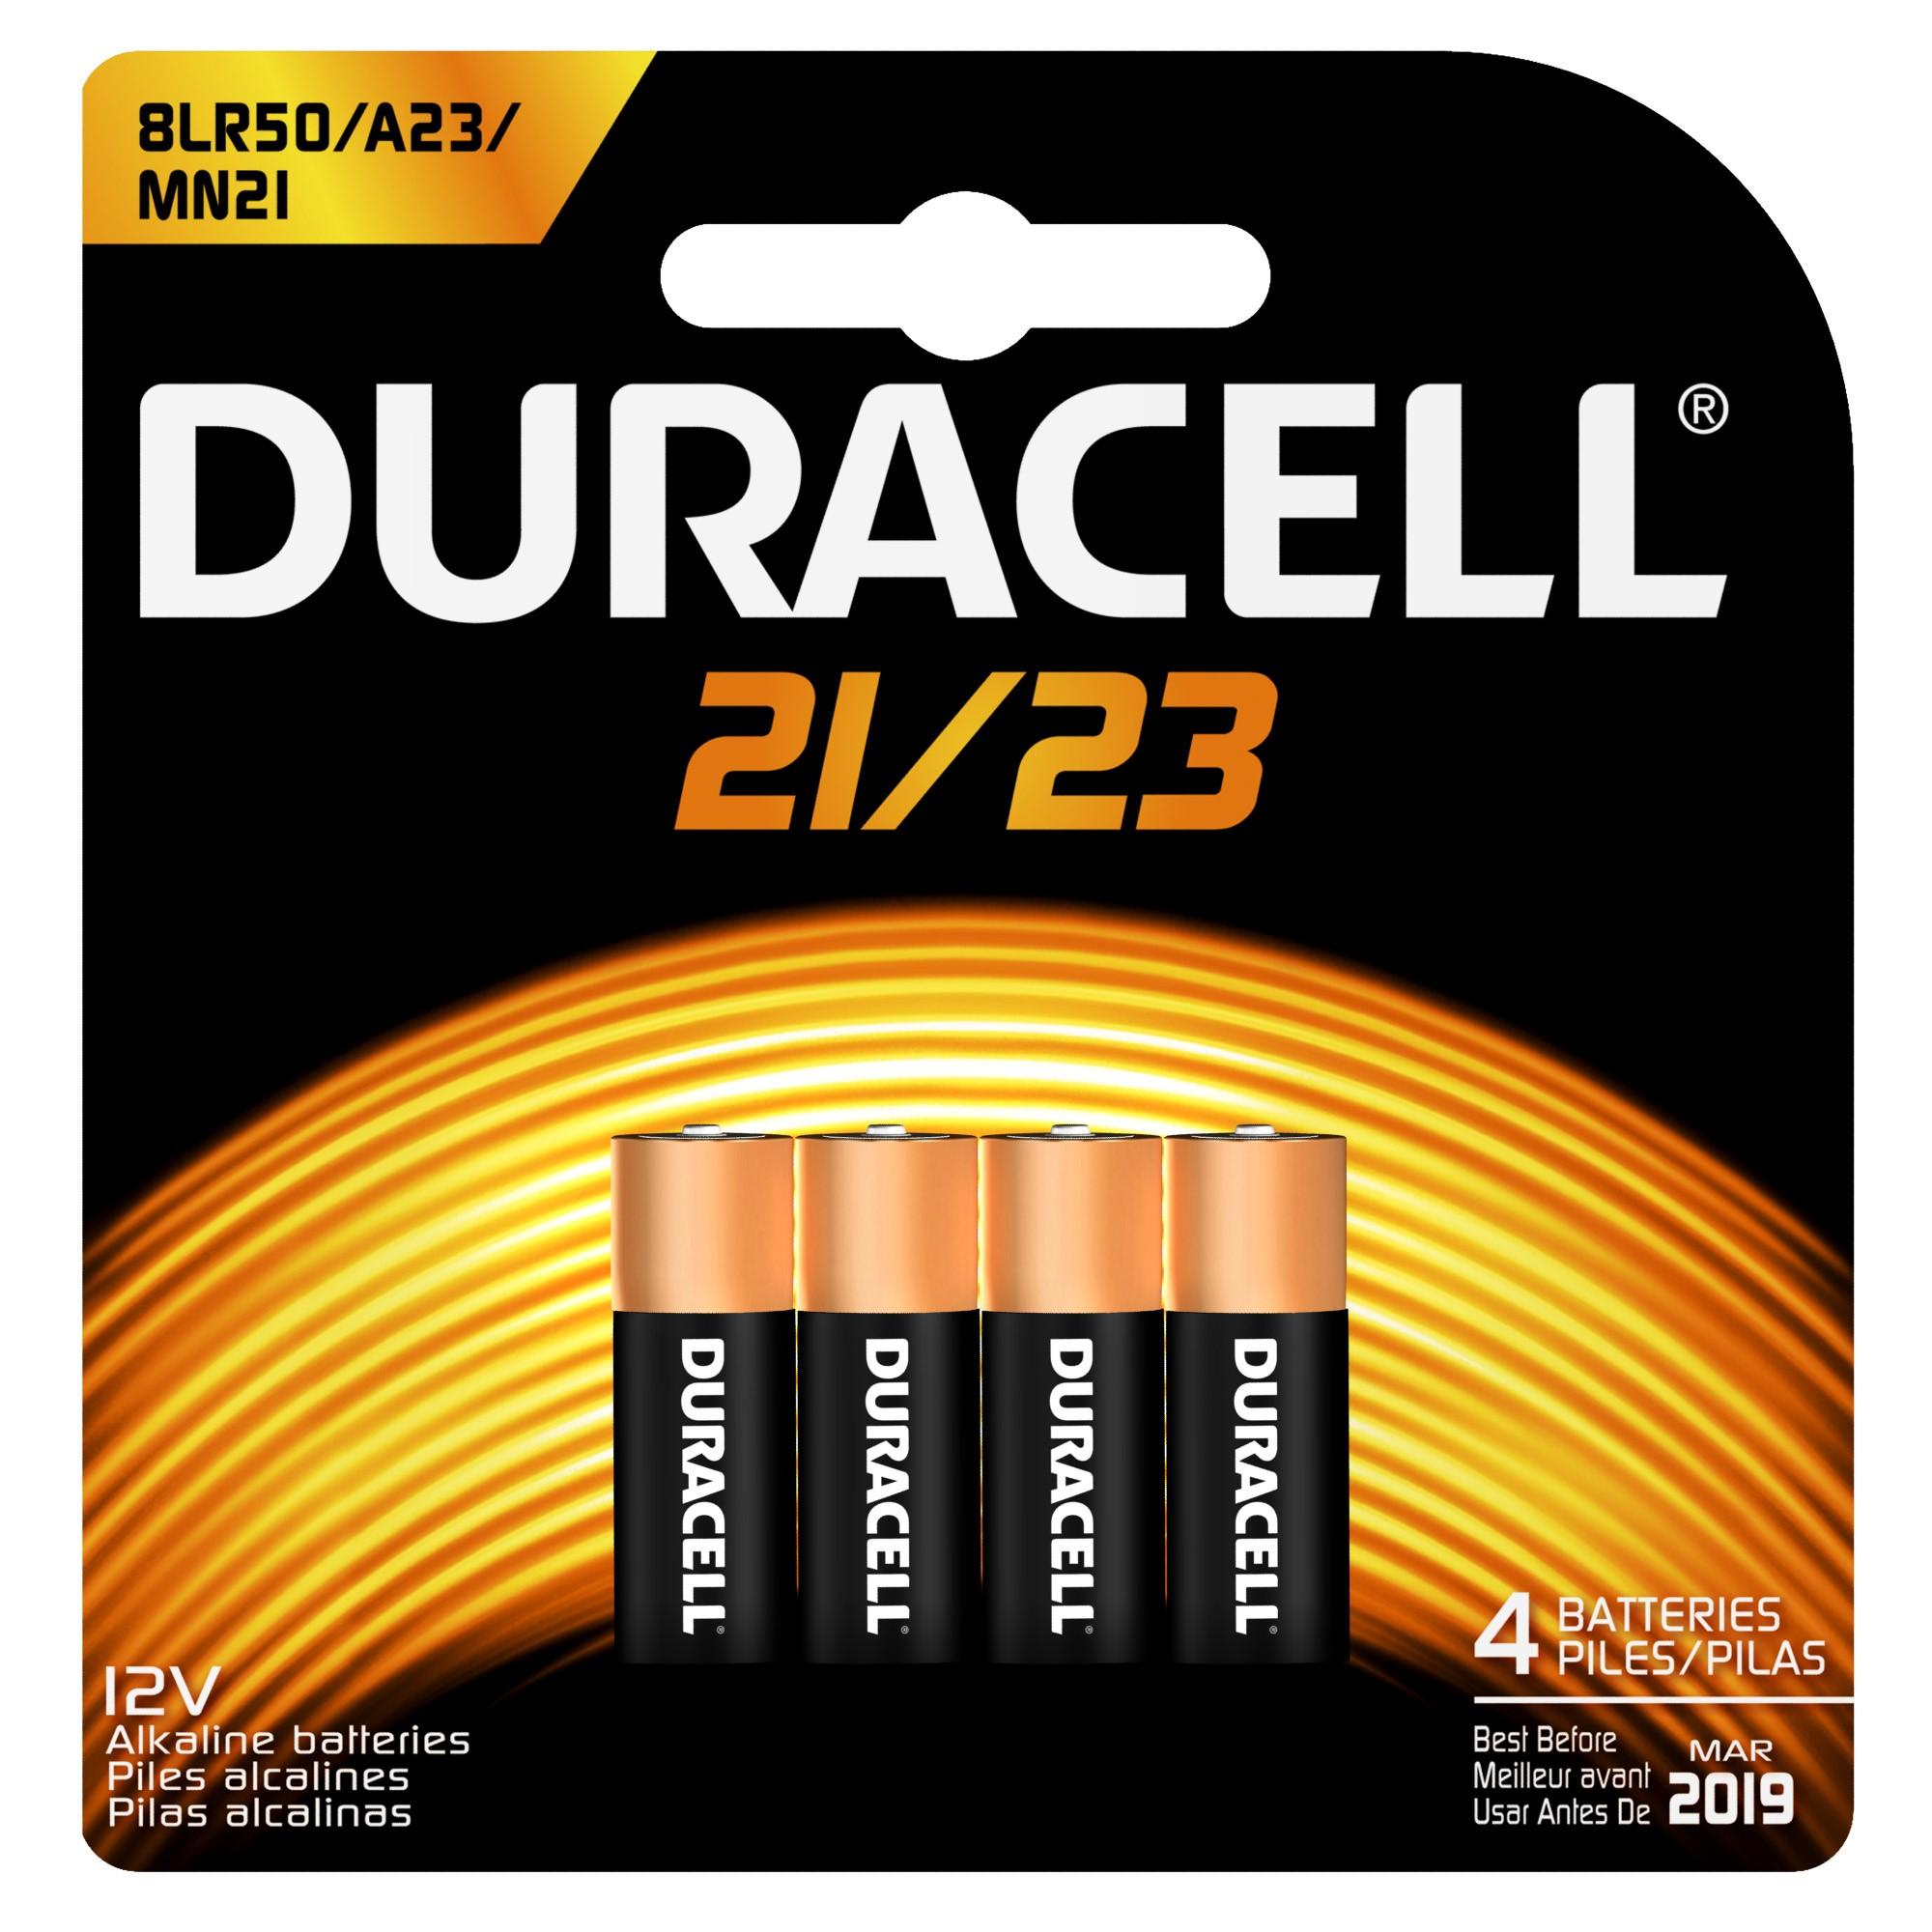 Duracell Alkaline MN21/23, 4 Count